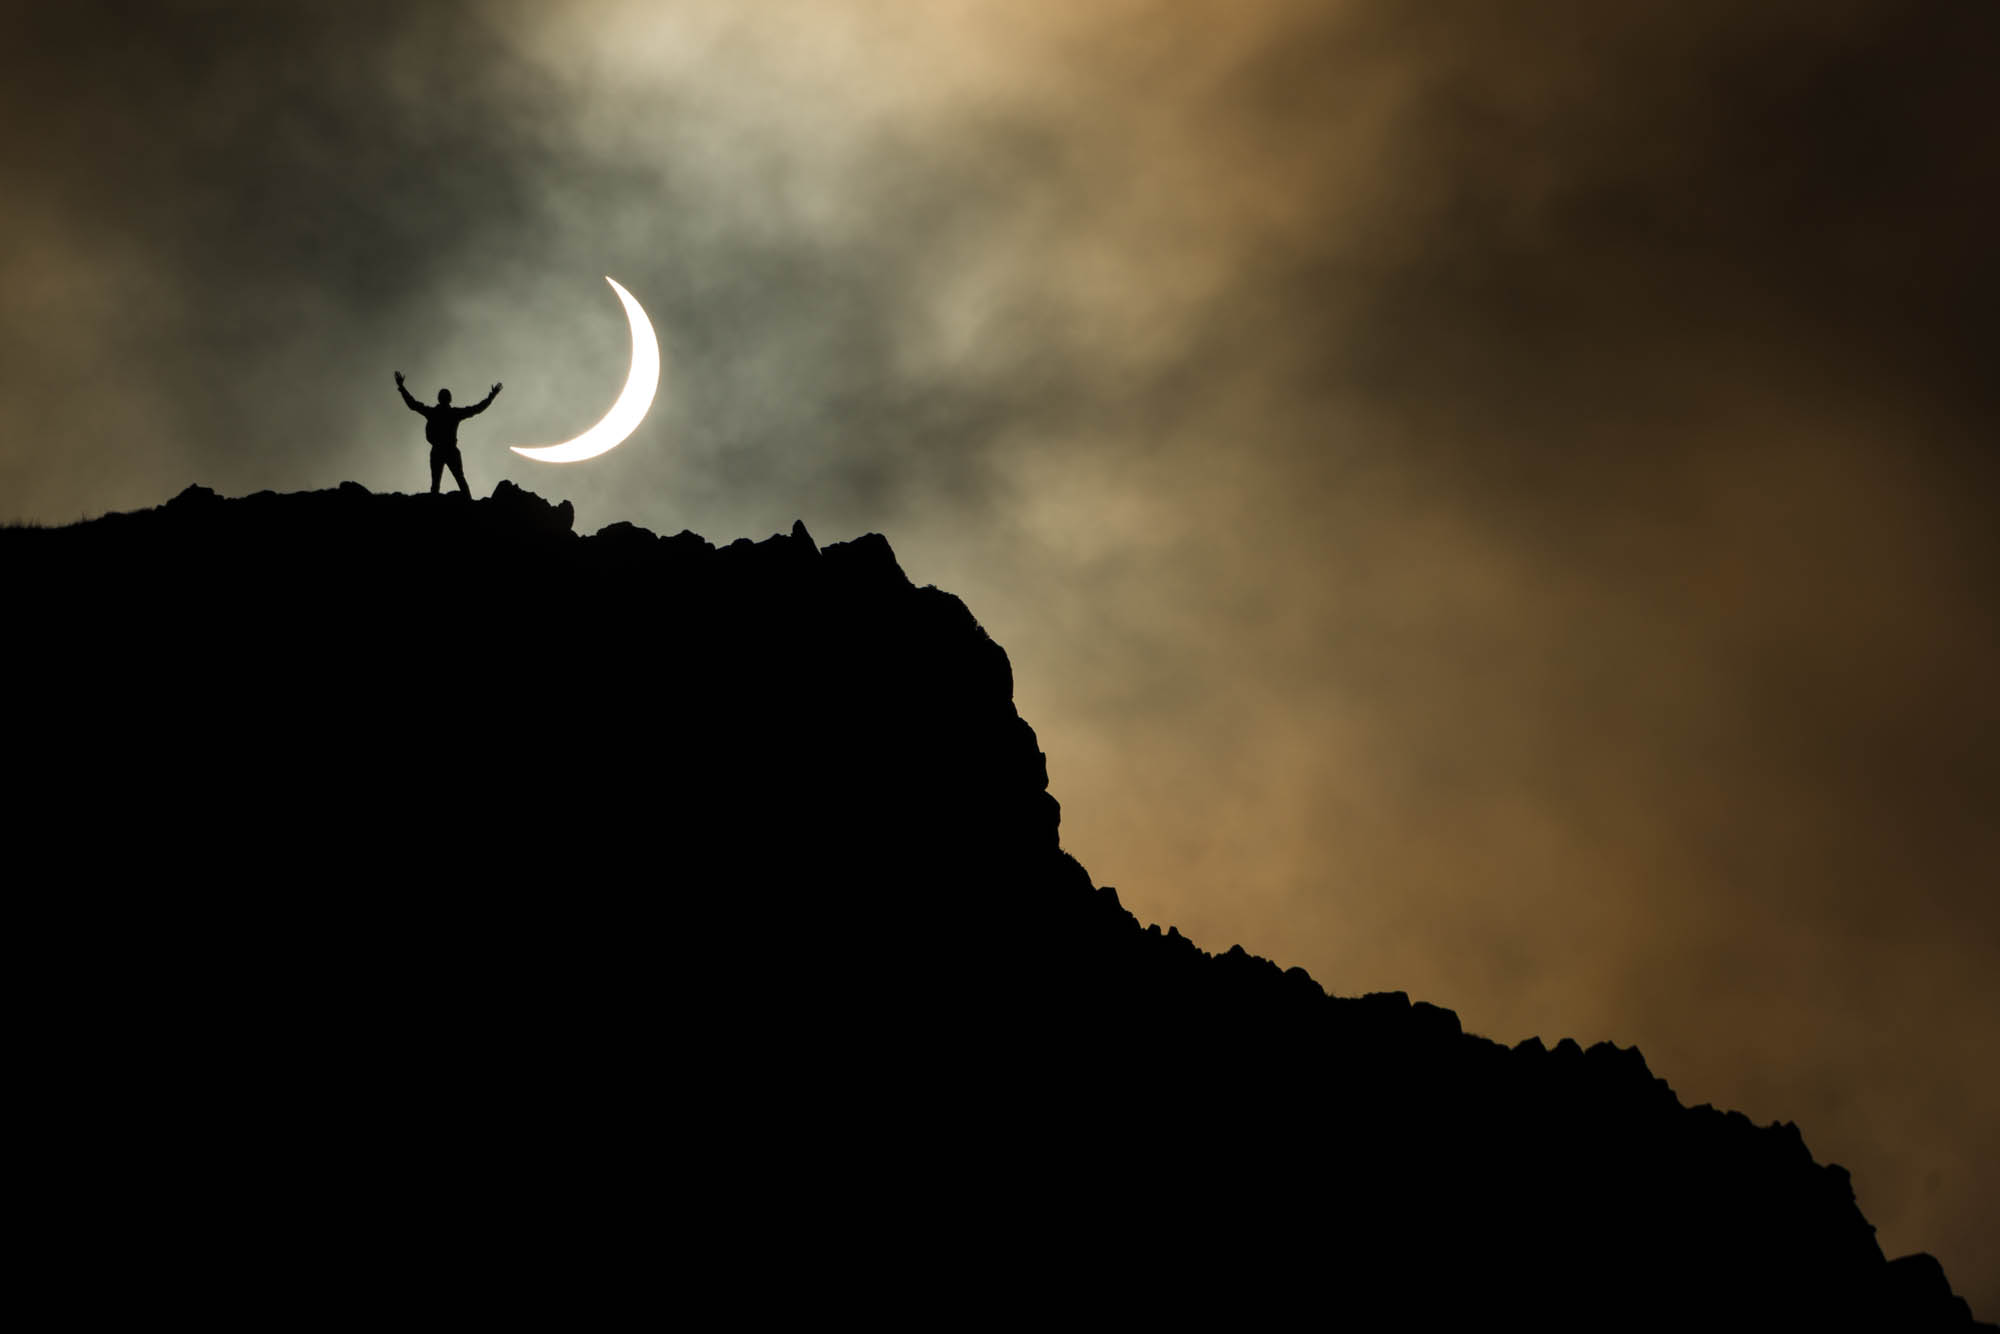 Edinburgh solar eclipse 2015 at Salisbury Crags